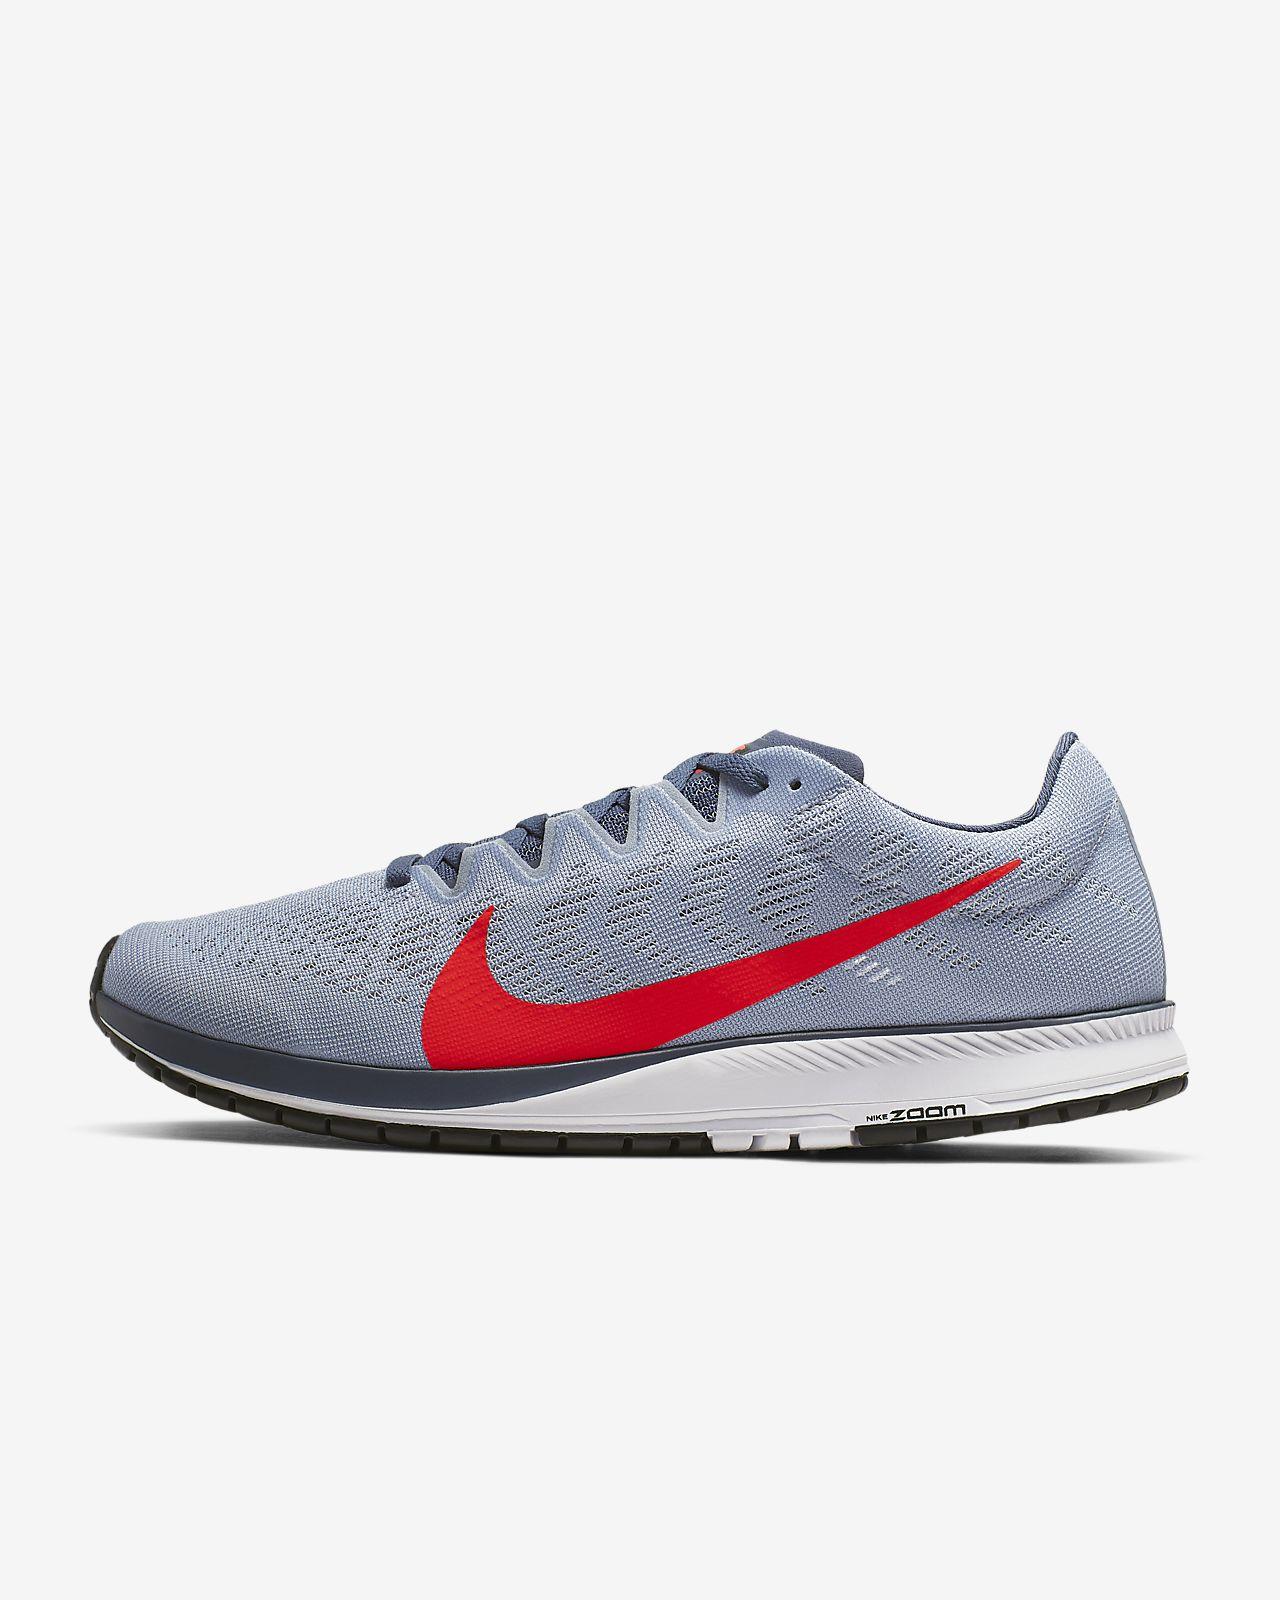 Nike Air Zoom Streak 7 Running Shoe